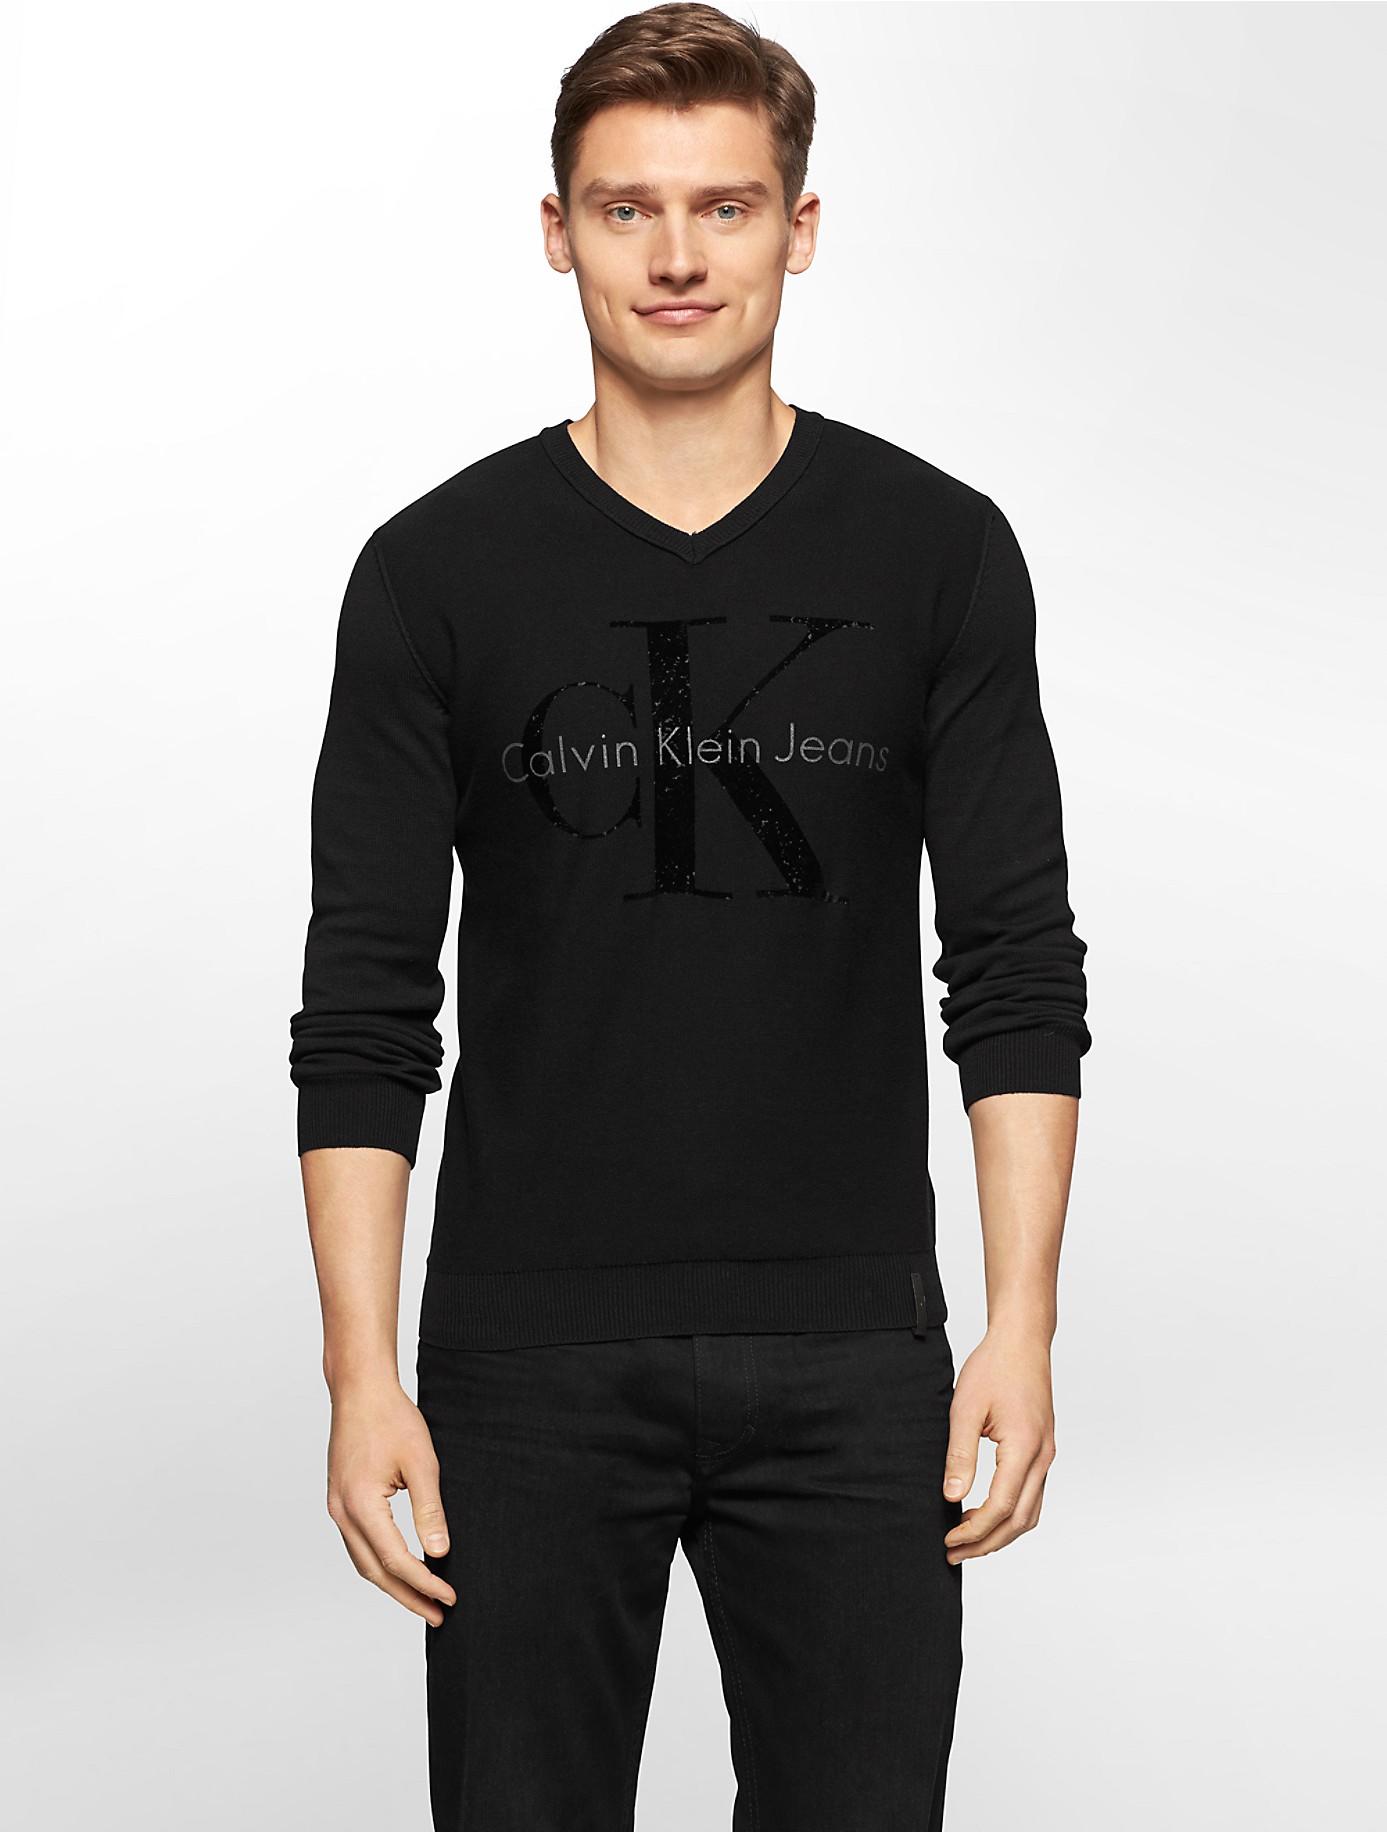 calvin klein jeans flock print logo crewneck sweater in. Black Bedroom Furniture Sets. Home Design Ideas